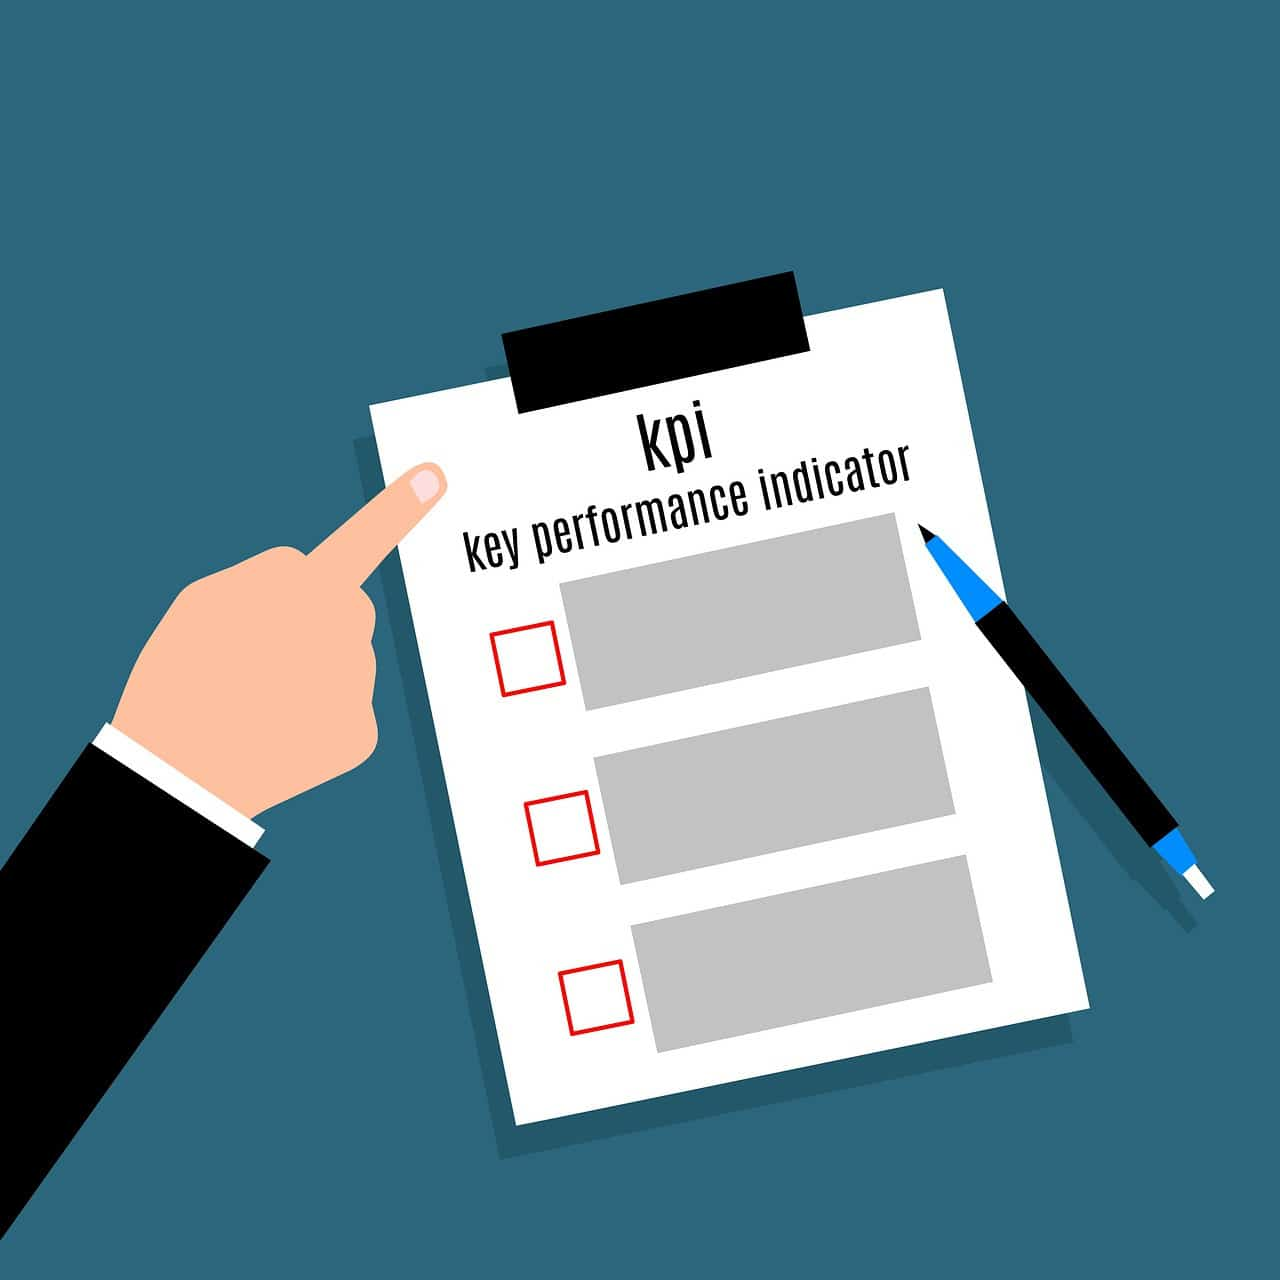 KPI mutatók